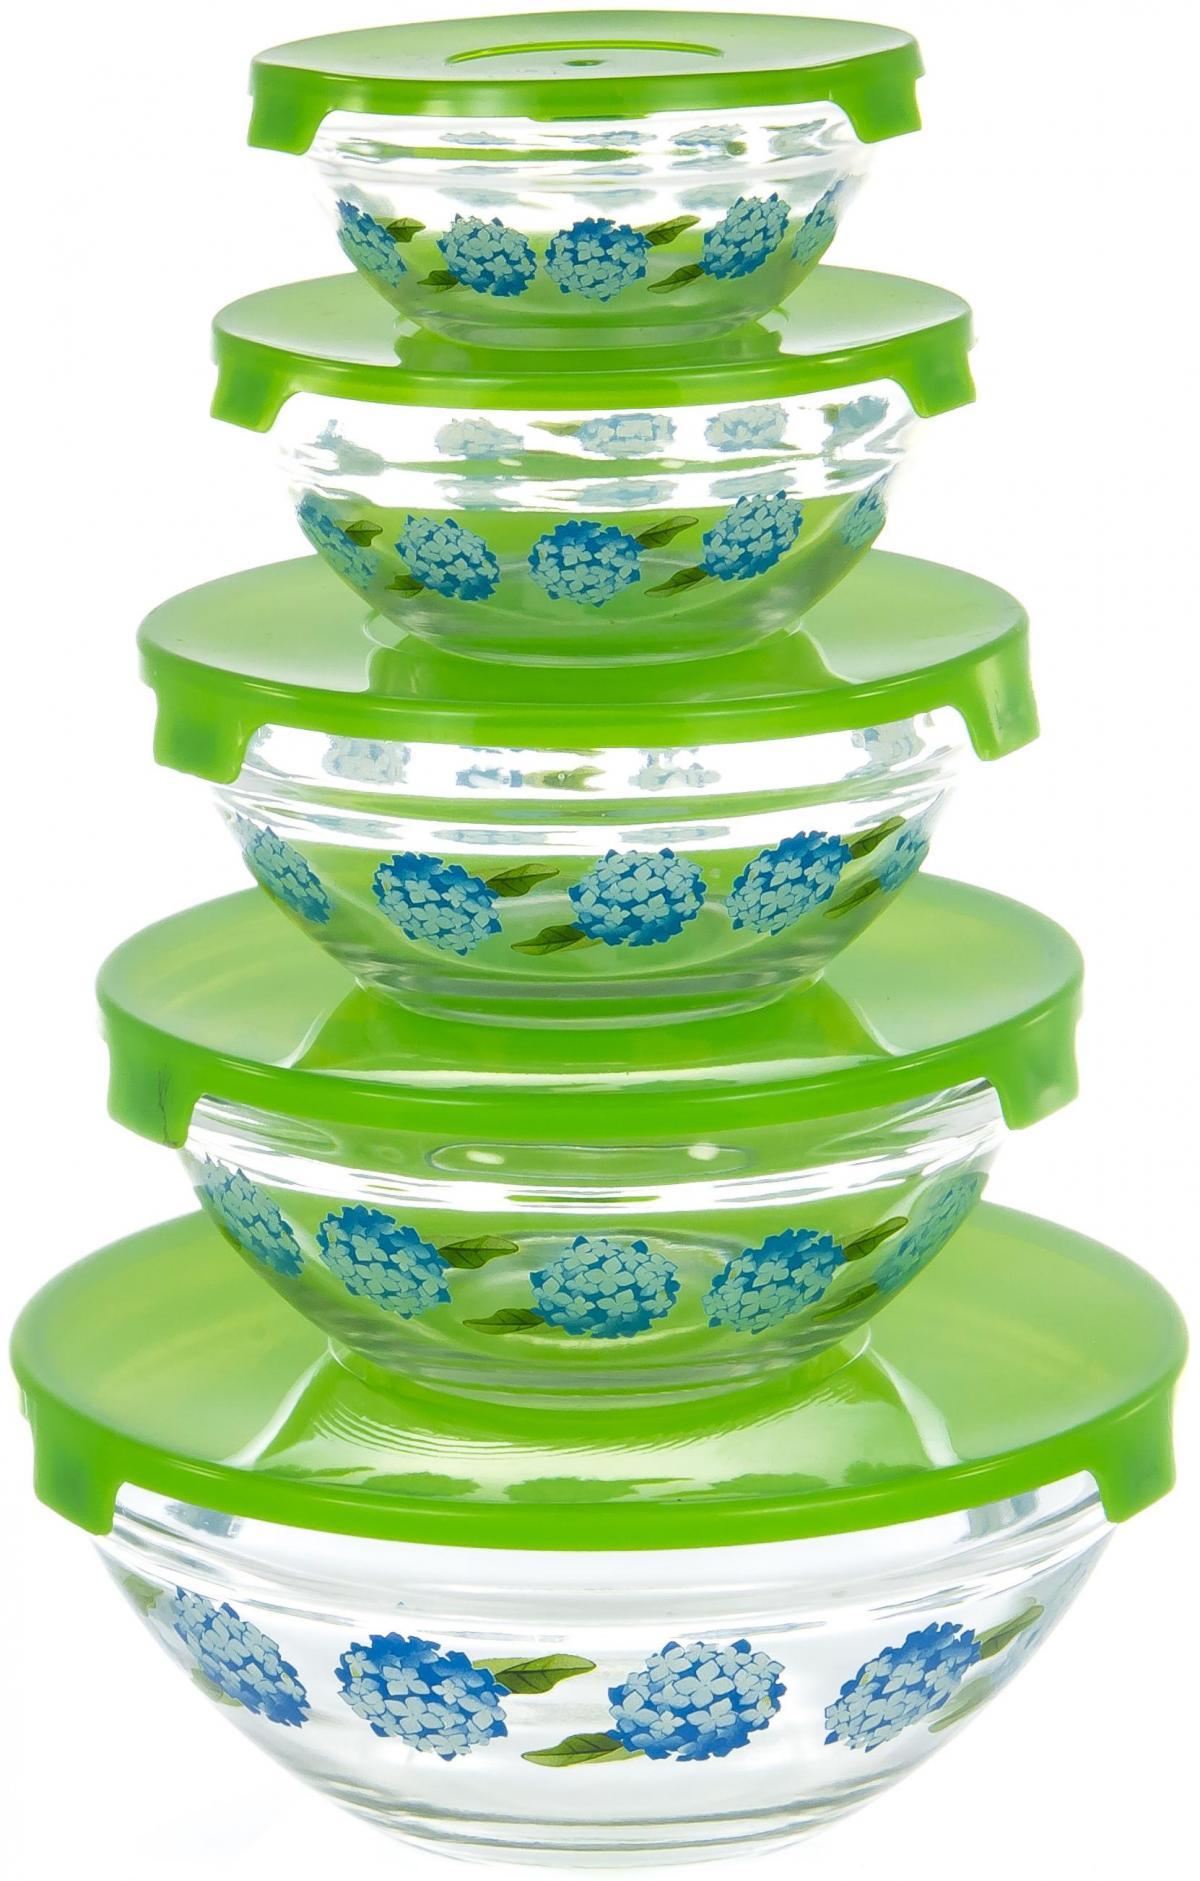 Набор салатников Olaff, с крышкой, 5 предметов. AX-5SB-G-02AX-5SB-G-02набор 5 салатников d-100мм, 103мм, 125мм, 140мм, 170мм с пластик.крышками, подарочная упаковка